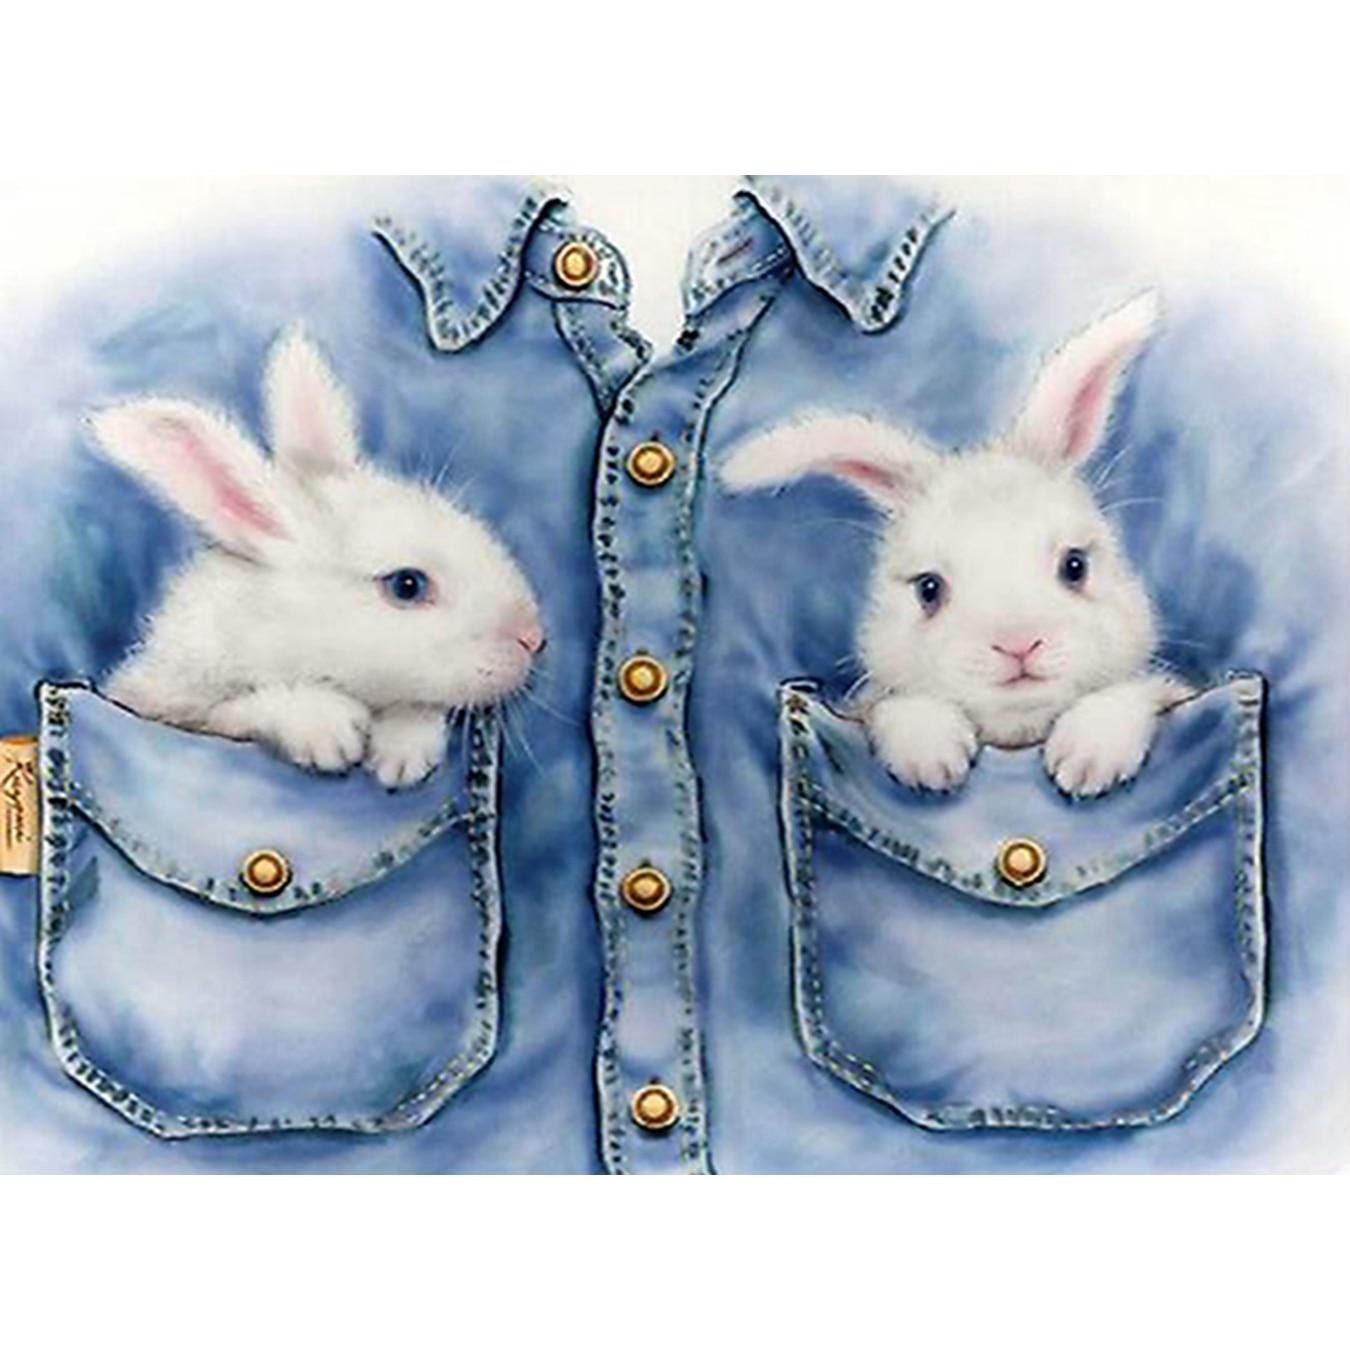 YTG Needlework Embroidery New 5D DIY Rabbit Picture Diamond Painting Cross Stitch Round Rhinestone Room Fashion Decoration Gift